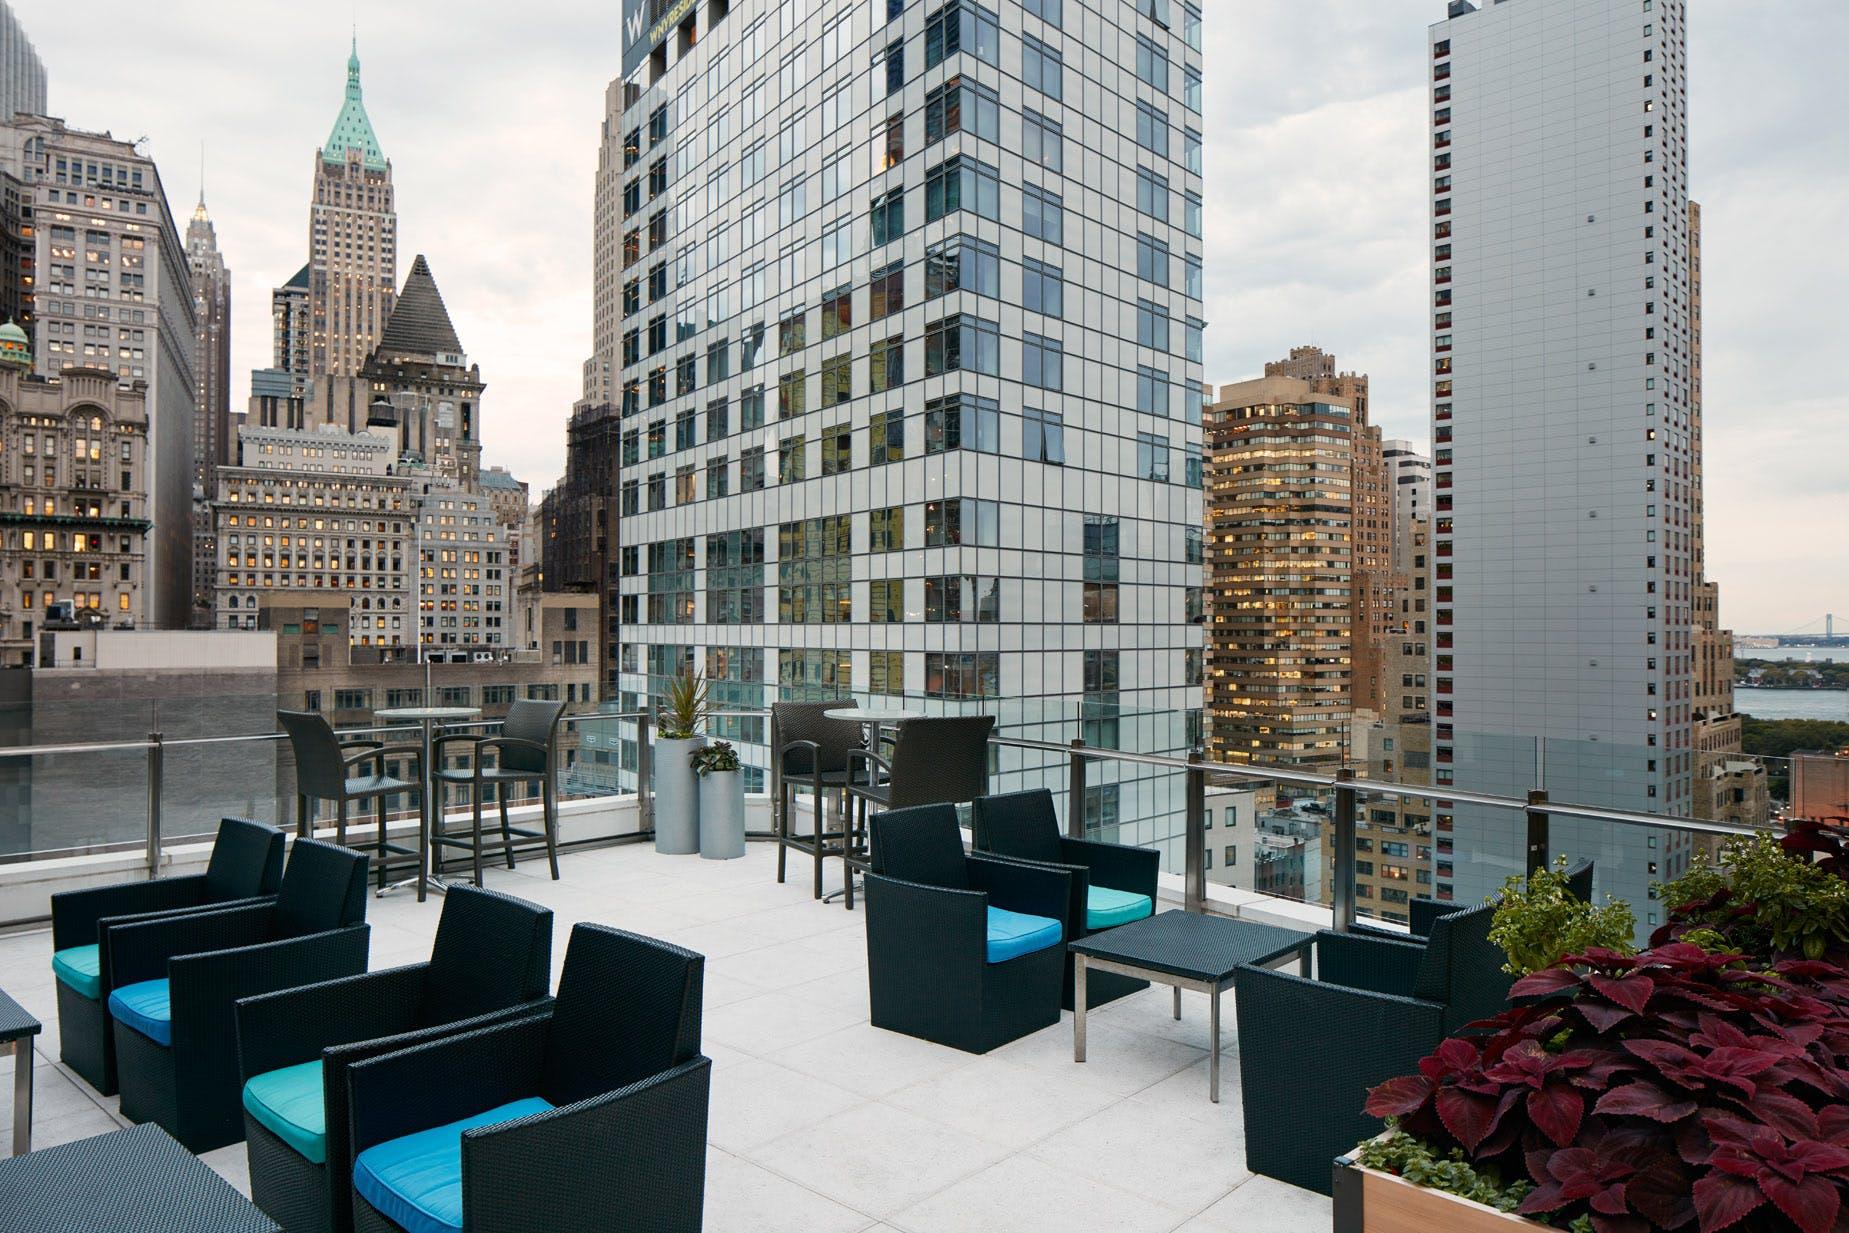 Sun Terrace at Club Quarters Hotel, World Trade Center